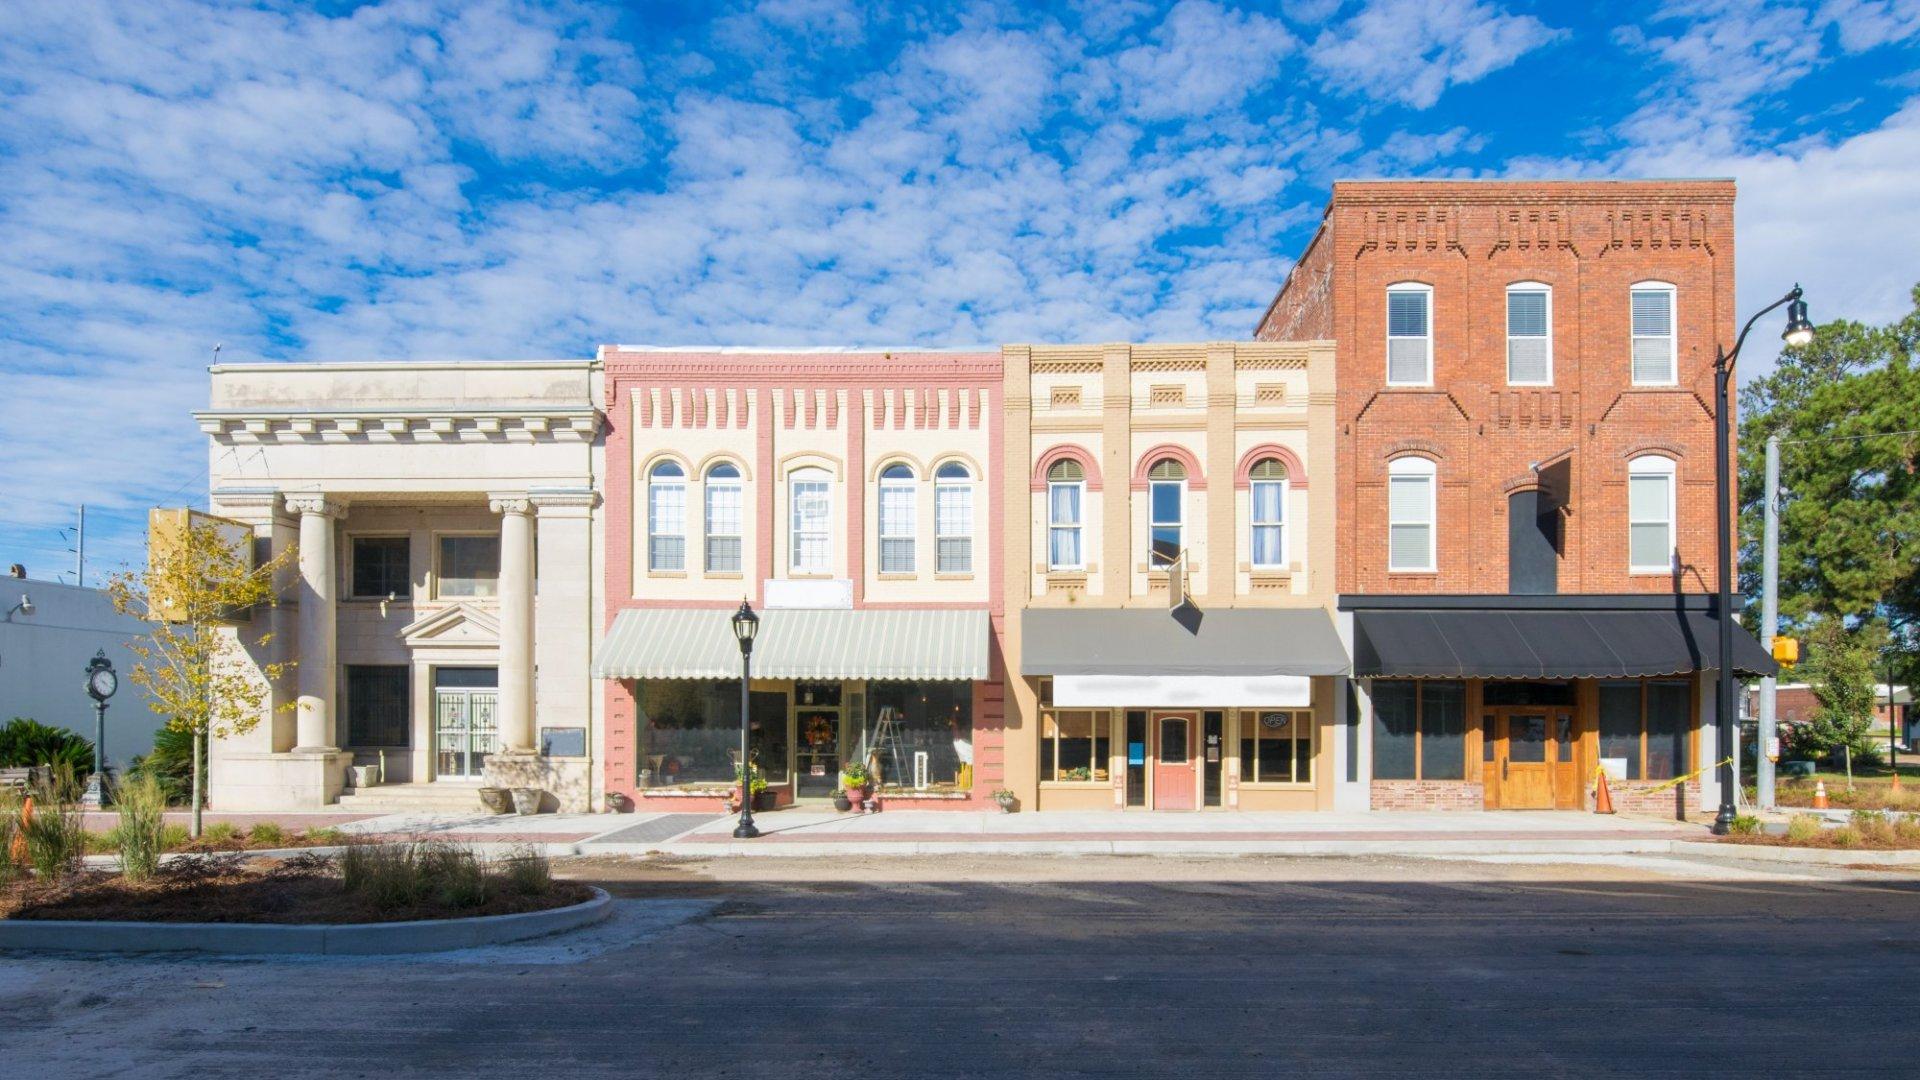 A Startup Raises $7 Million To Disrupt Brick & Mortar Retail